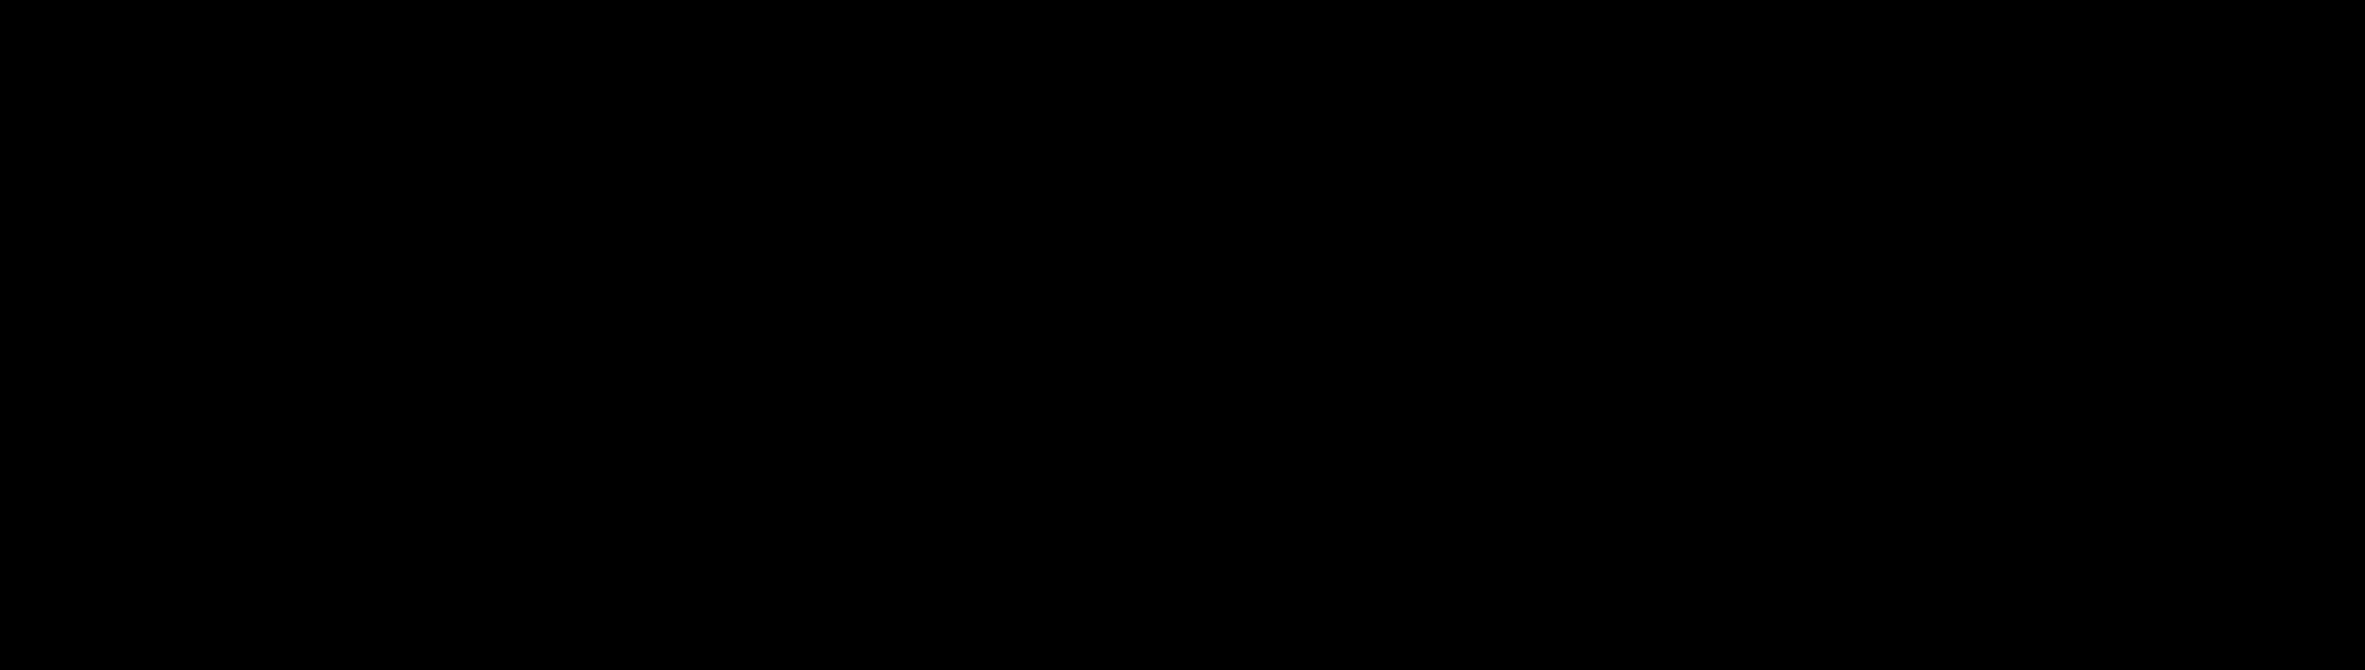 Xbox logo blac